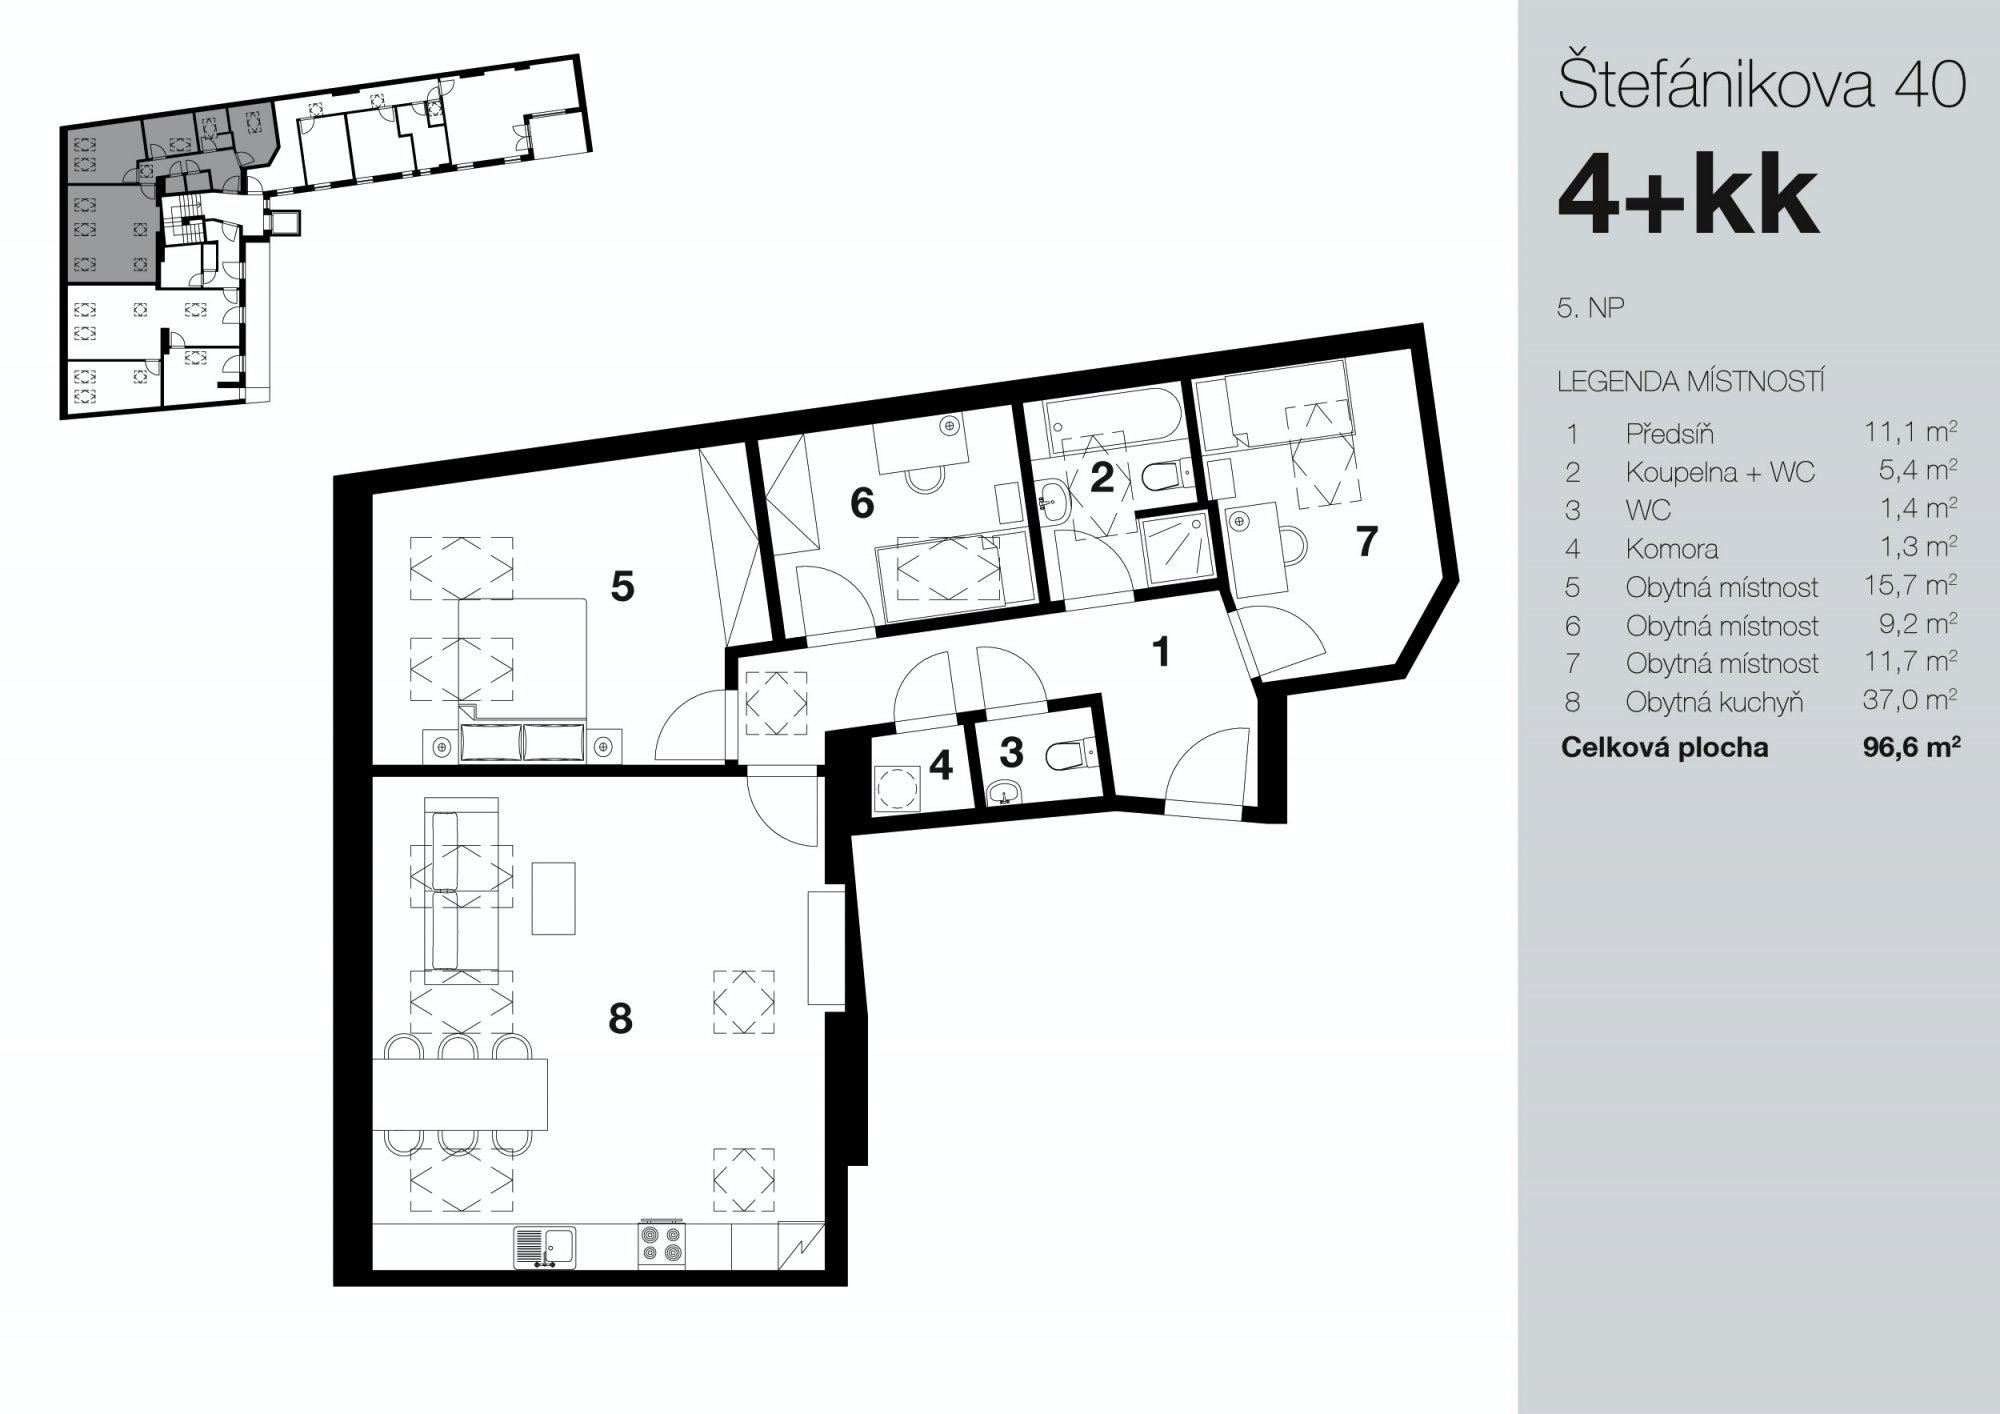 Půdorys - Půdní byt 4+kk, plocha 97 m², ulice Štefánikova, Praha 5 - Smíchov